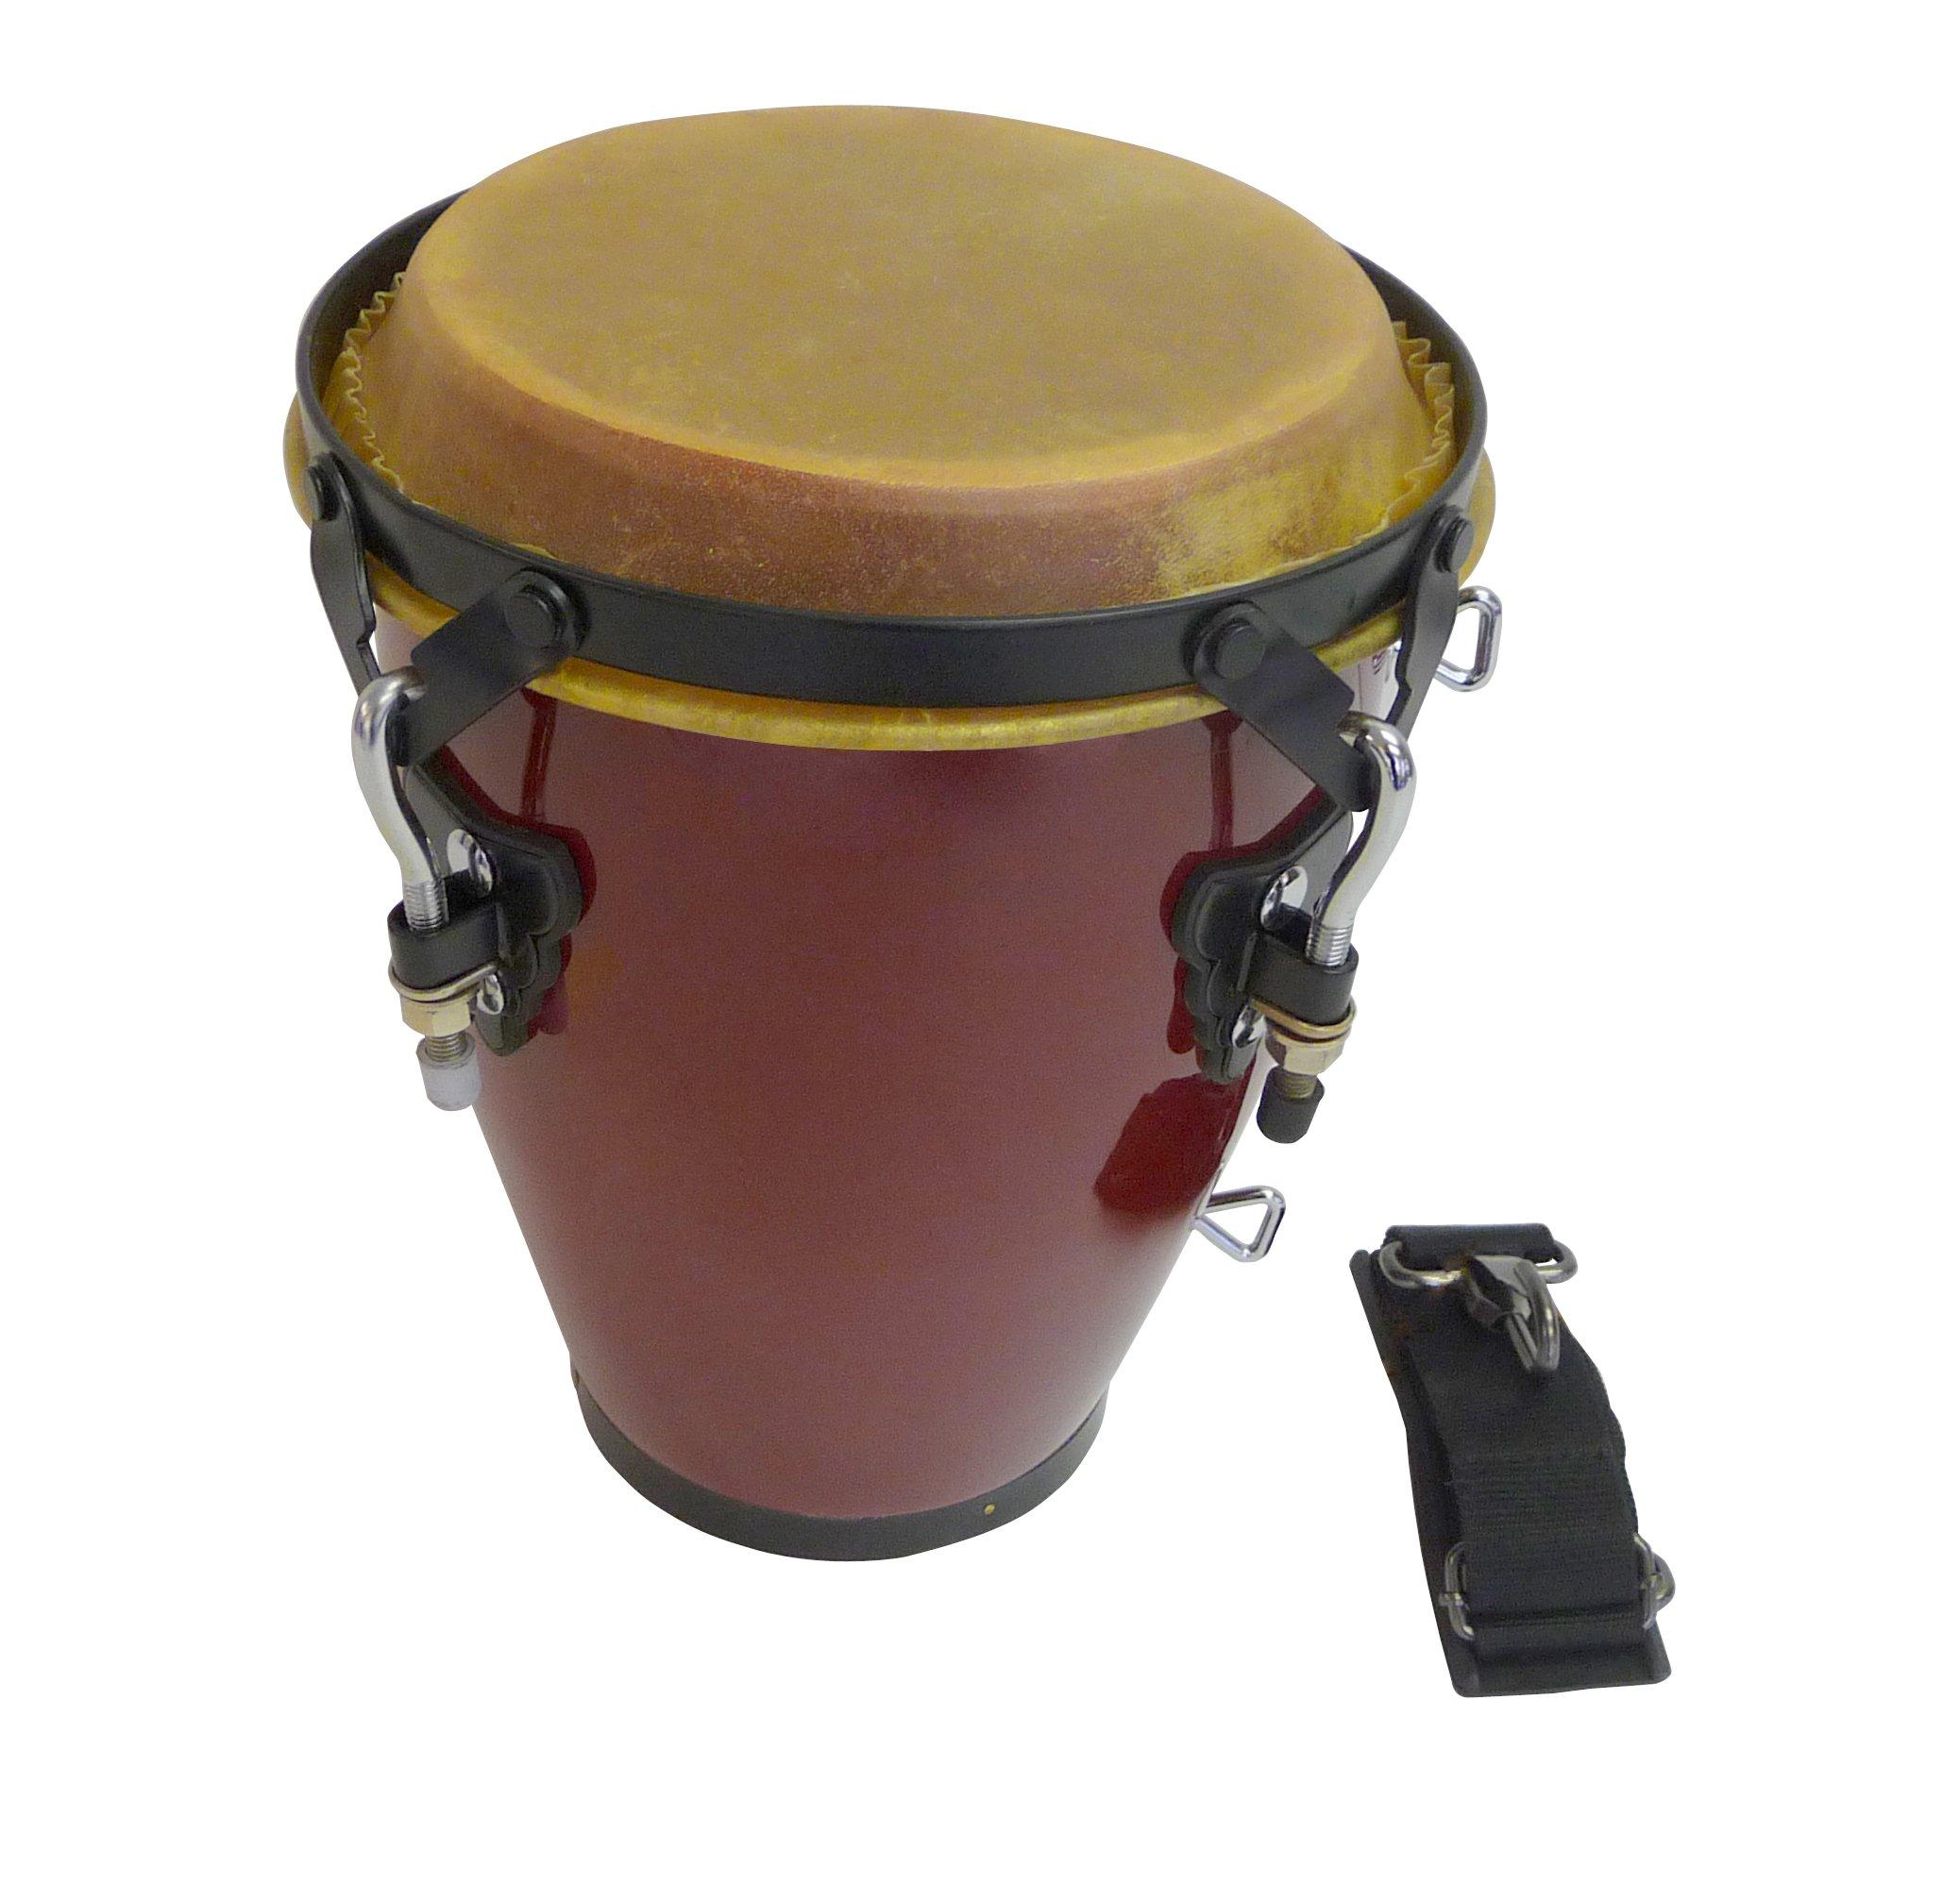 Suzuki Musical Instrument Corporation CG-10 7-Inch Tunable Conga with Strap